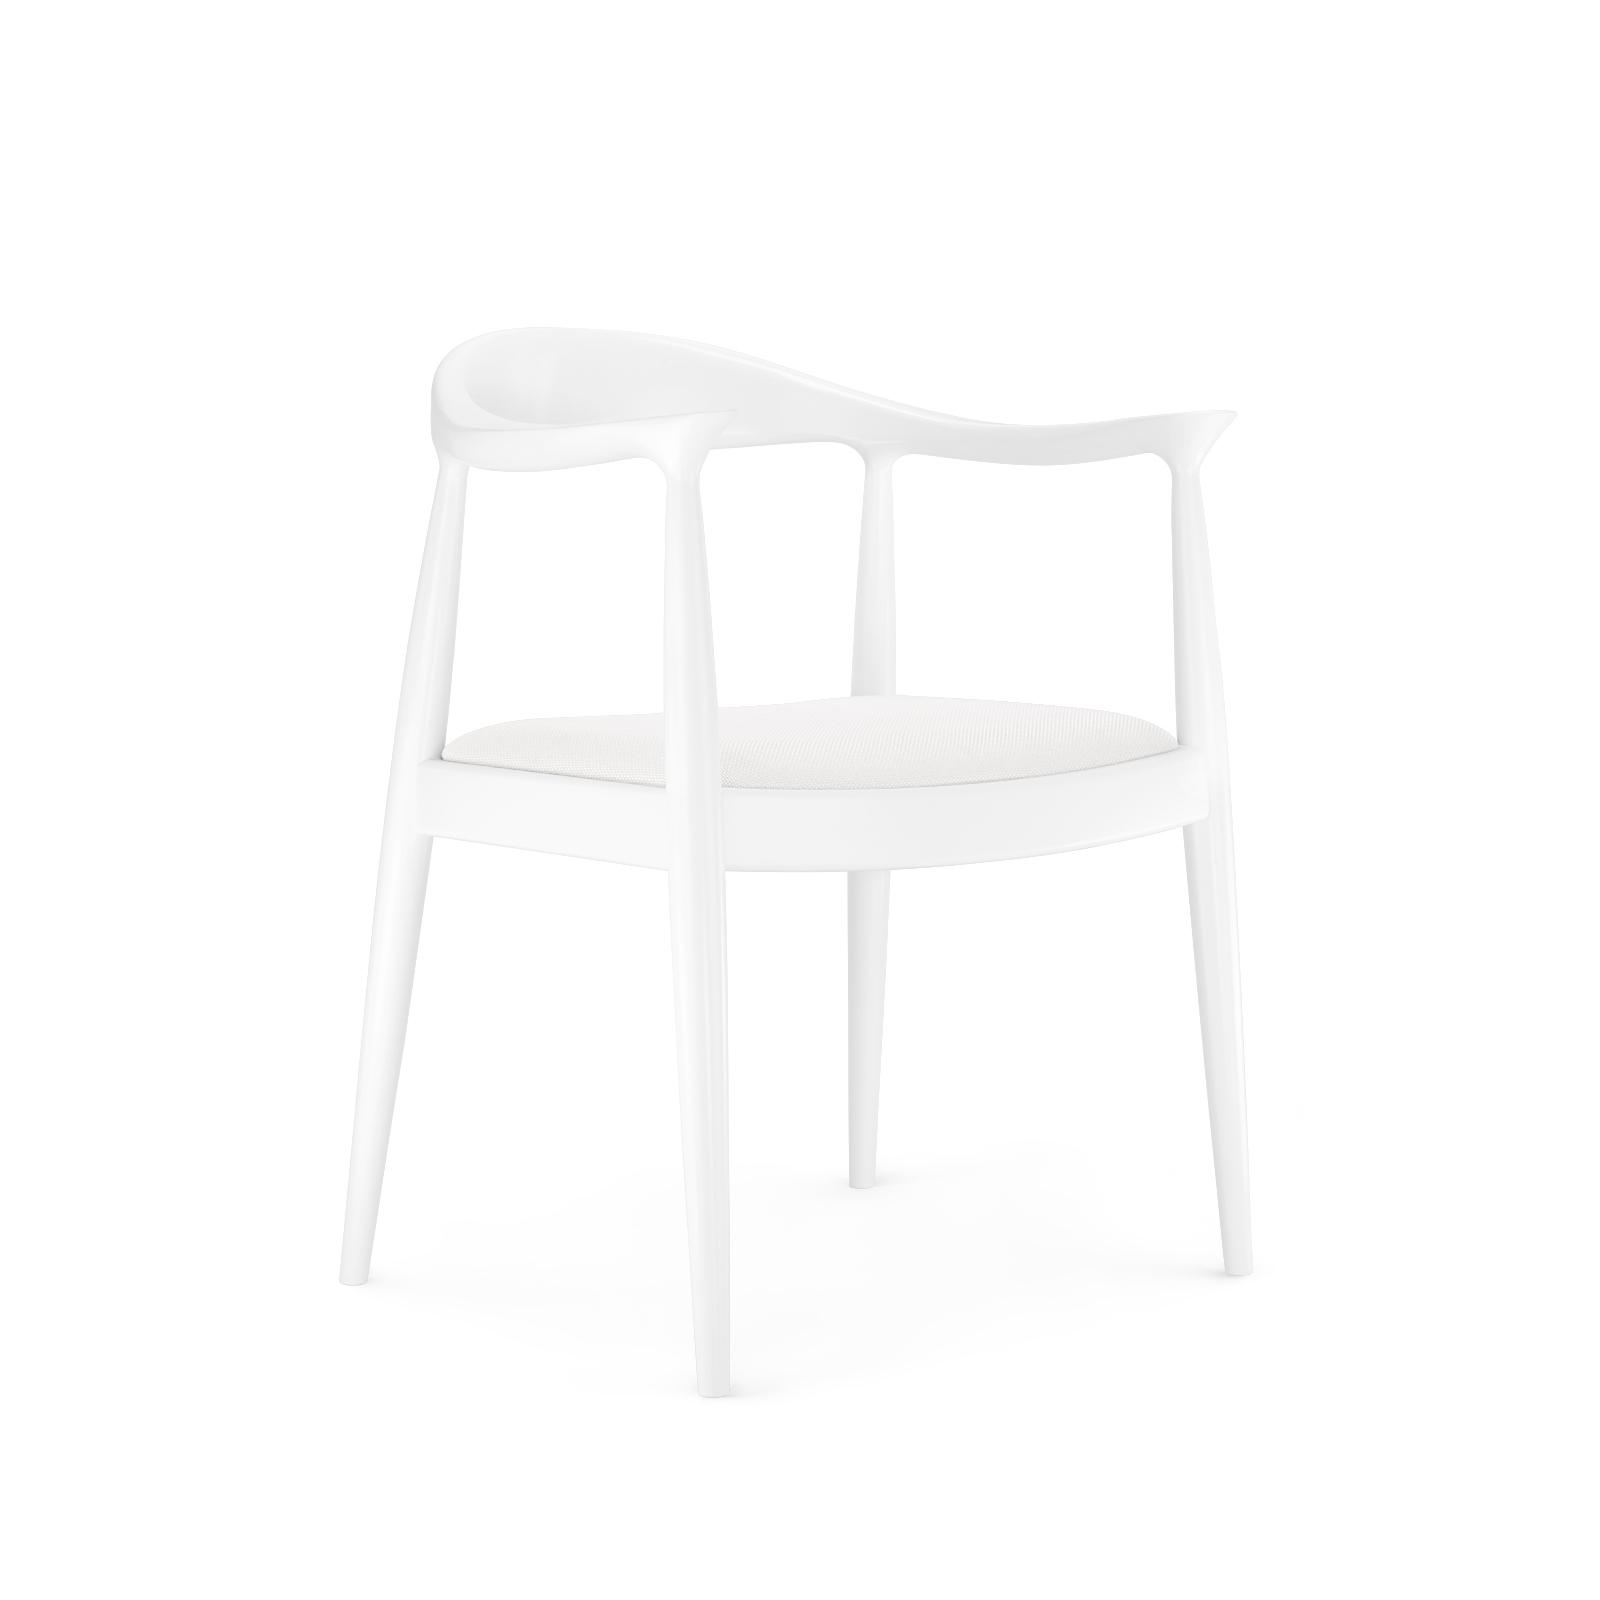 Danish Armchair White Bungalow 5